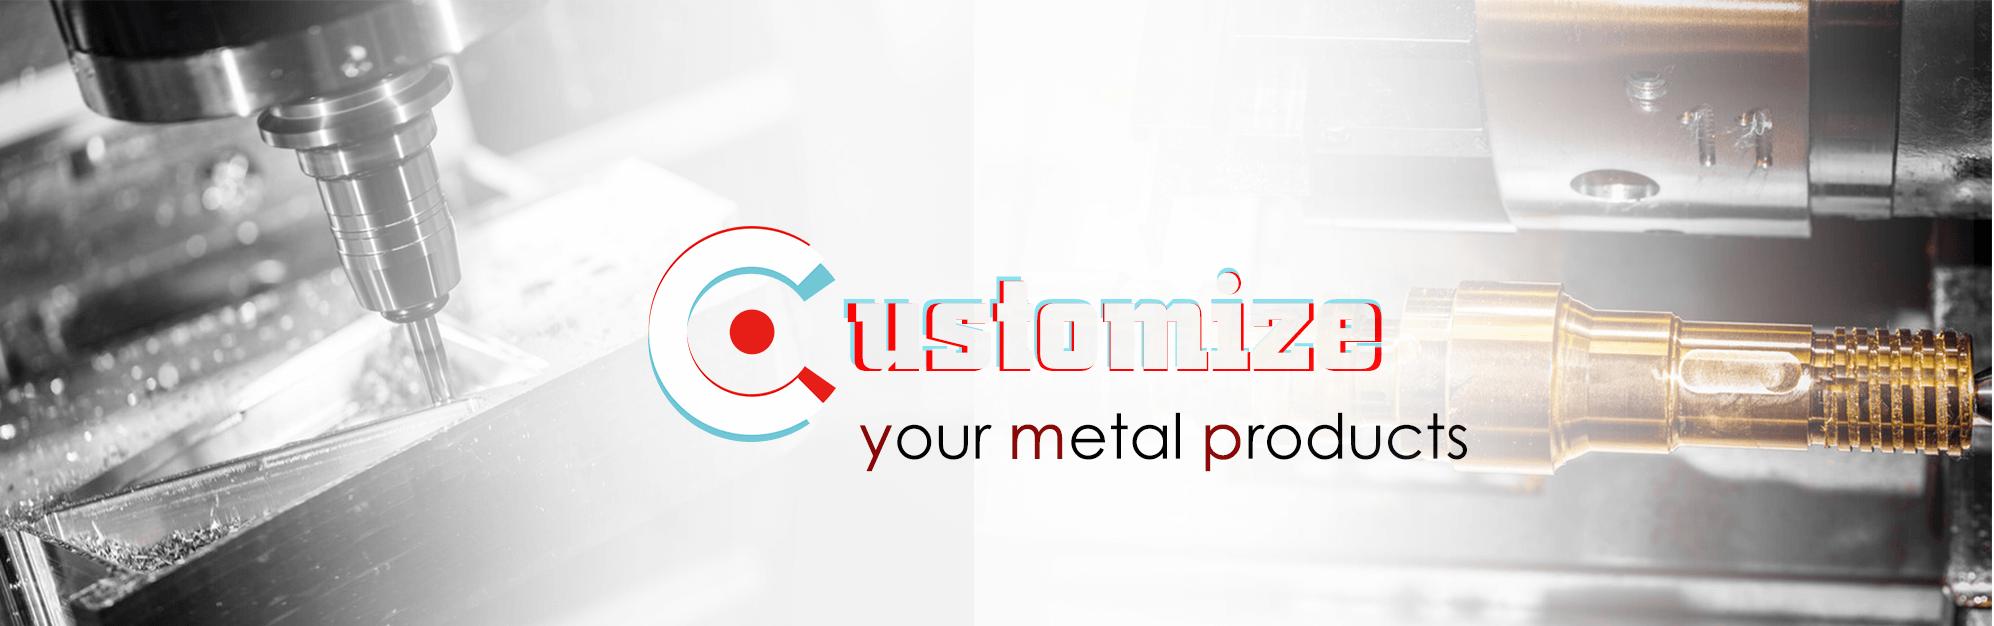 CUSTOM-Greatnameplates.com